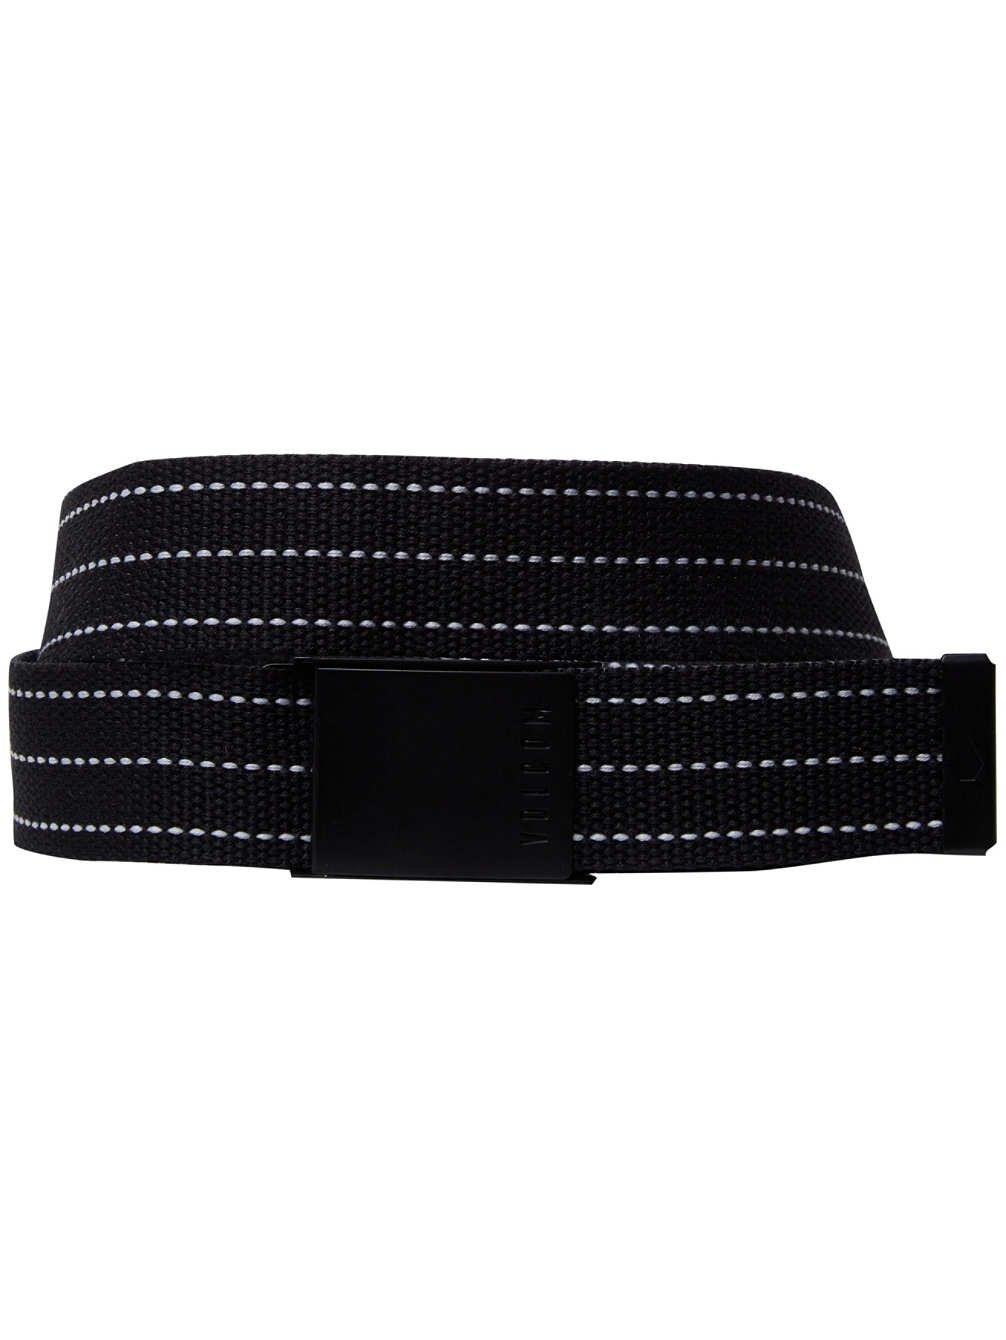 Volcom Herren Horizon Web Gürtel Black One Size D5931850